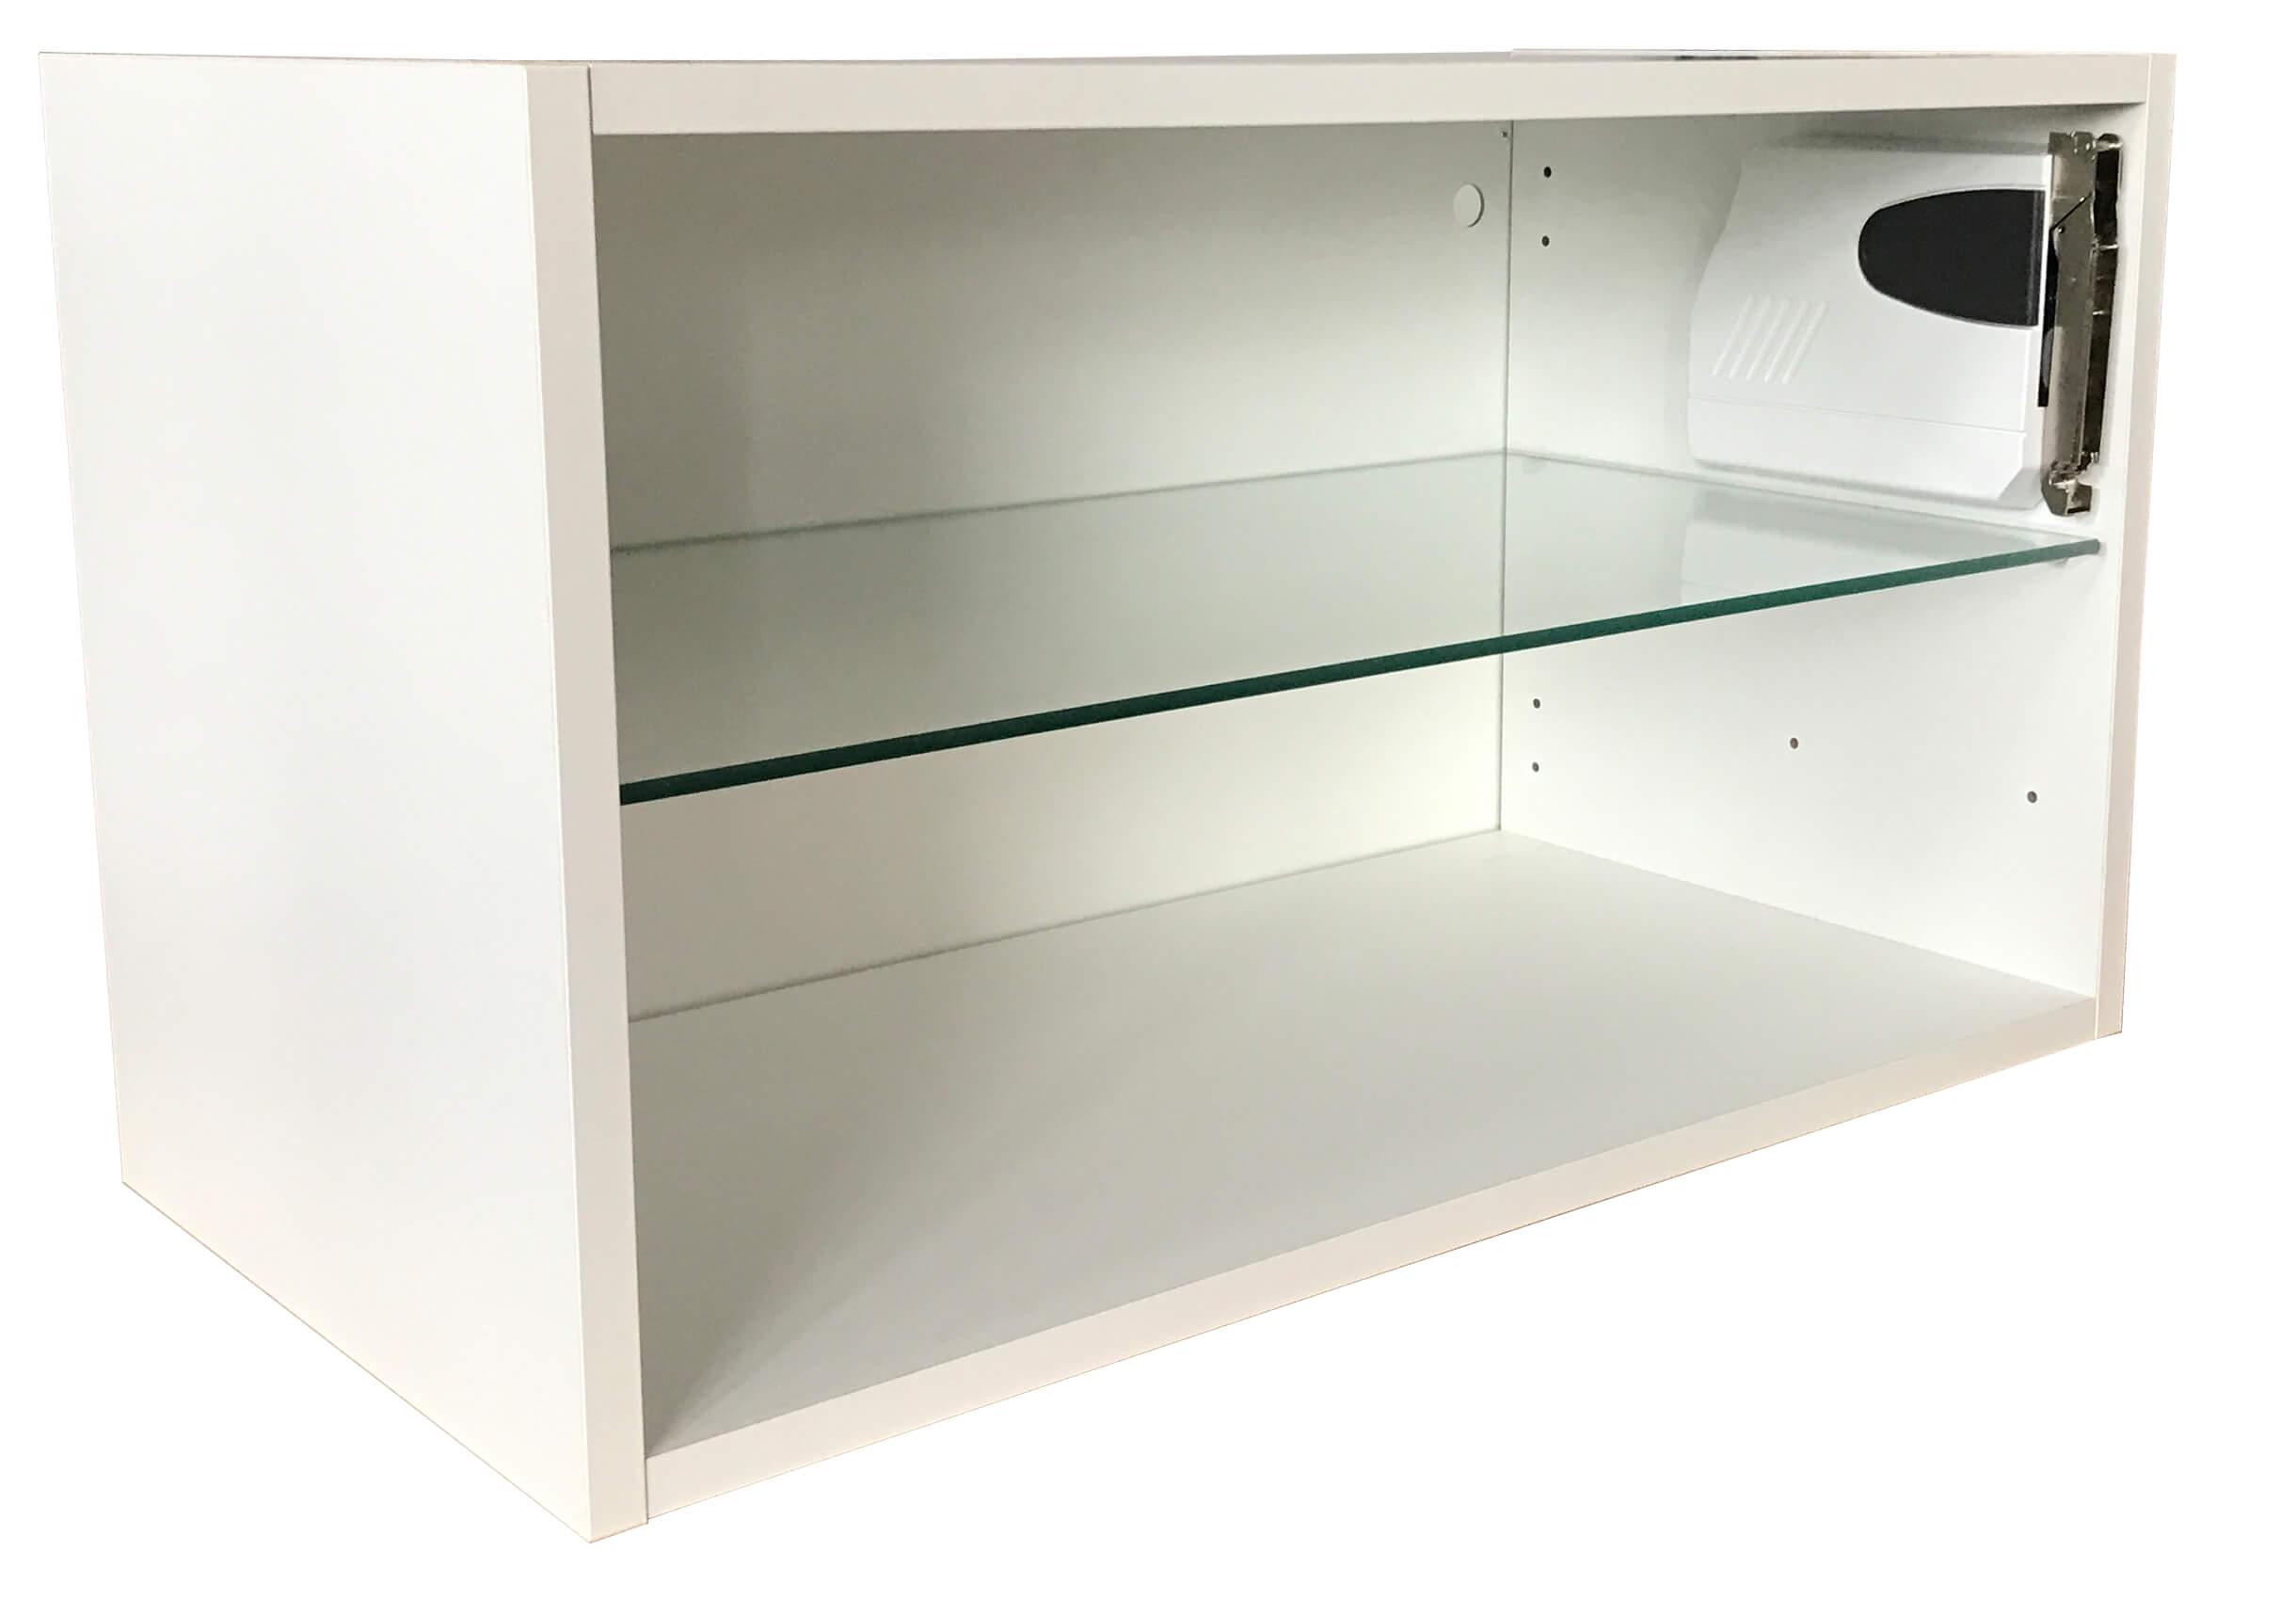 Ikea Faktum Wandschrank Mit Glasboen Klappscharniere 901 323 79